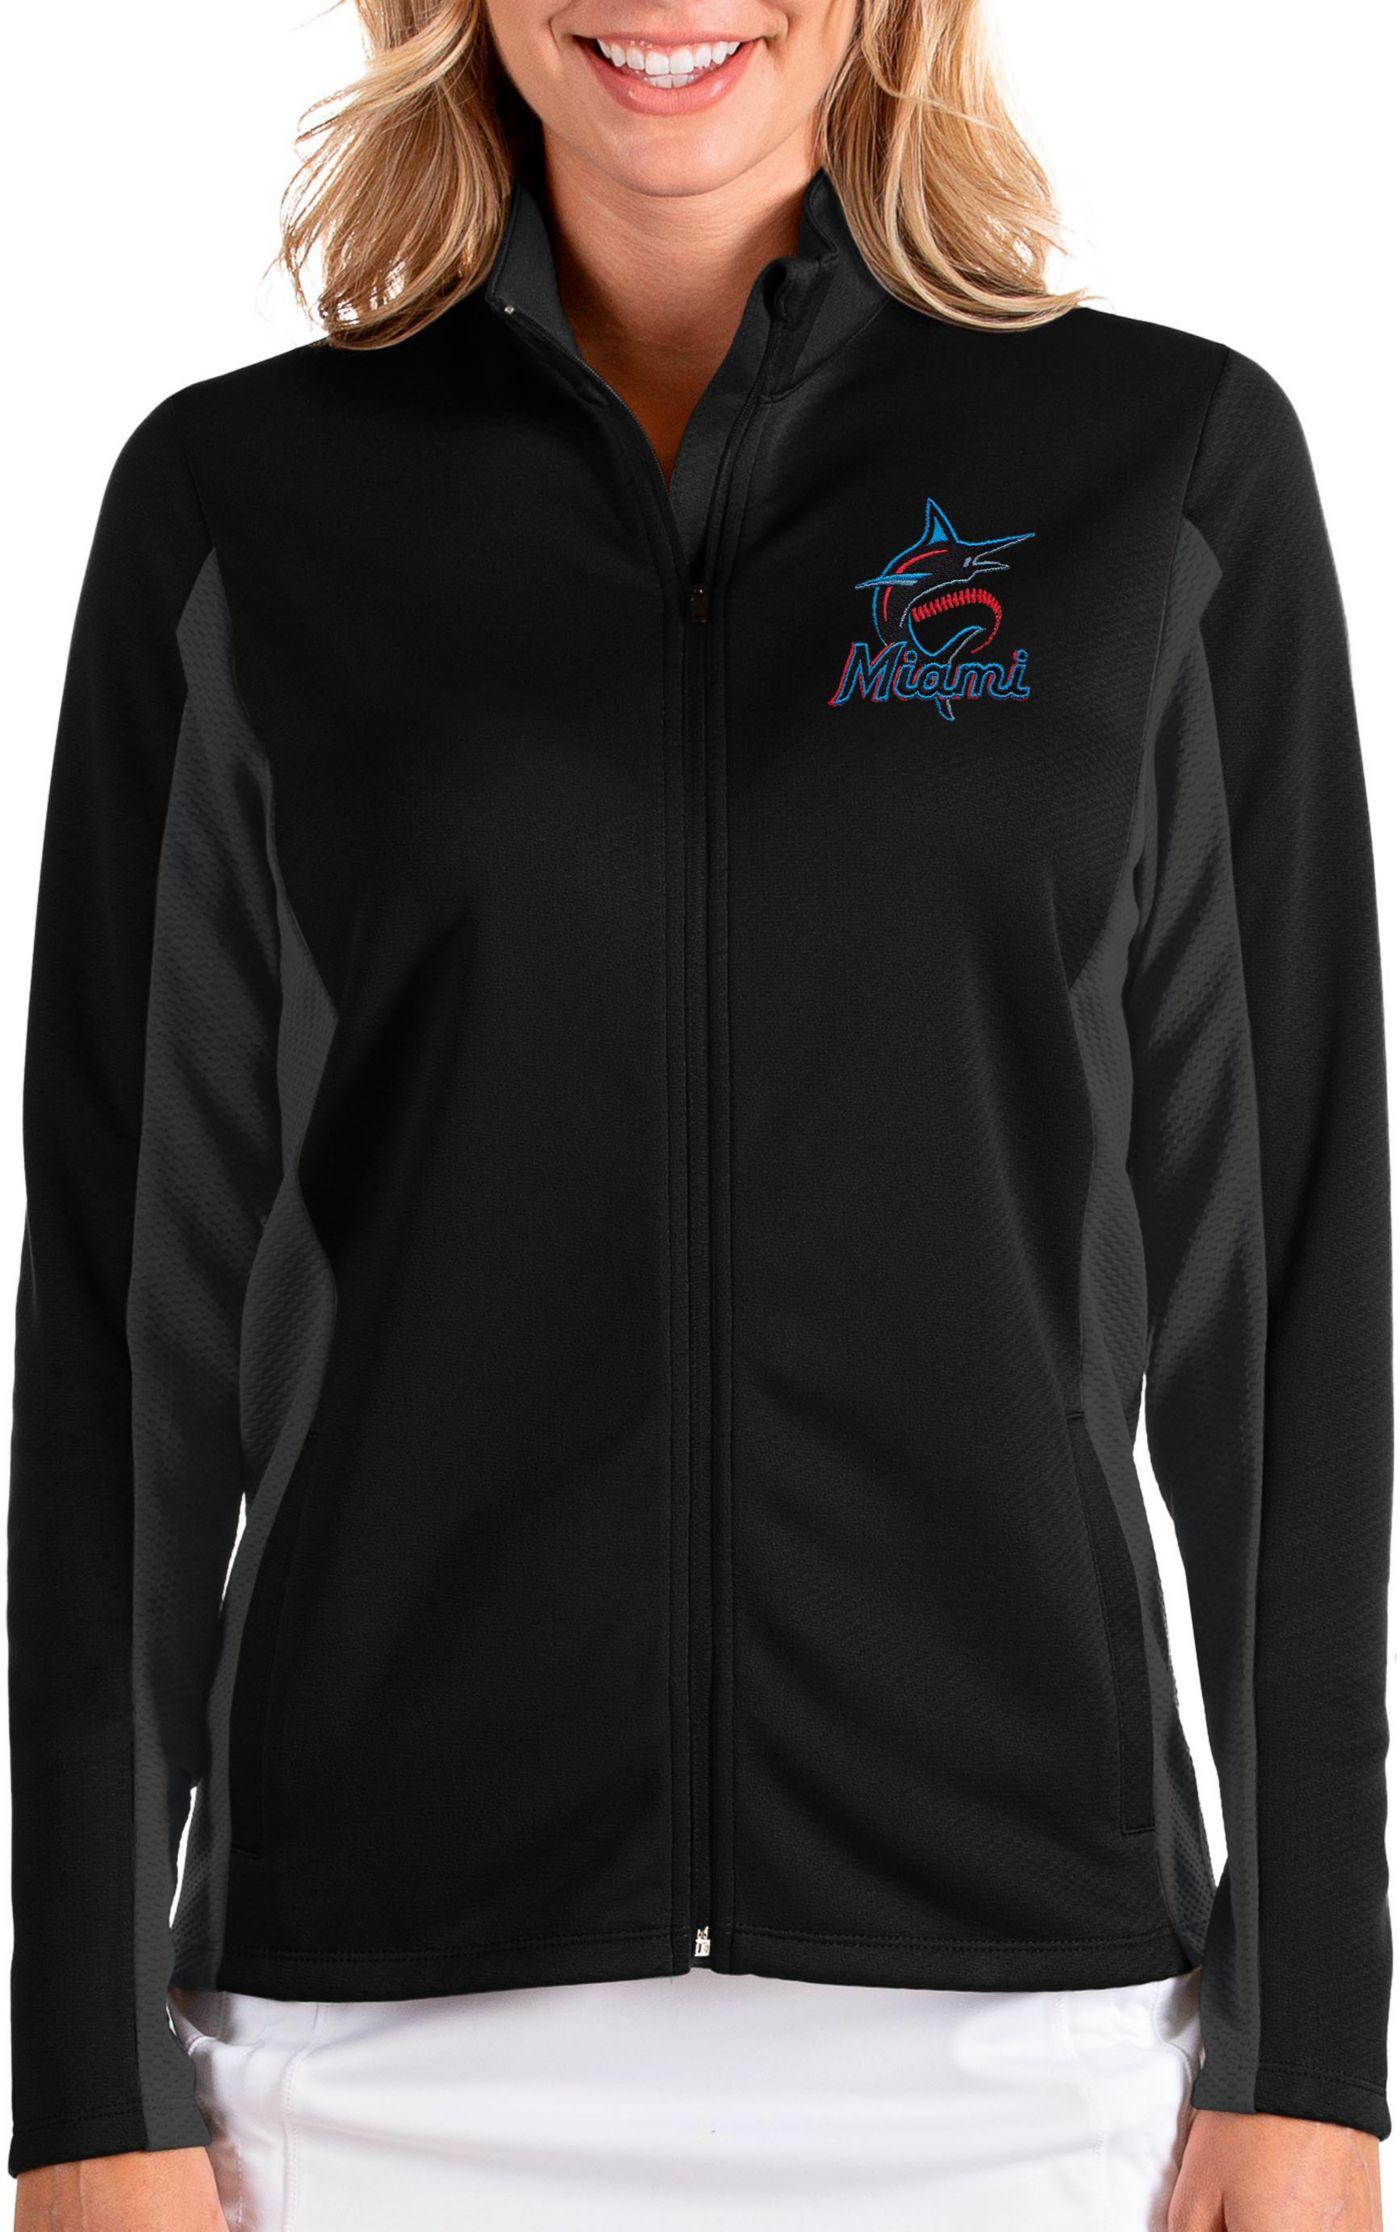 Antigua Women's Miami Marlins Black Passage Full-Zip Jacket